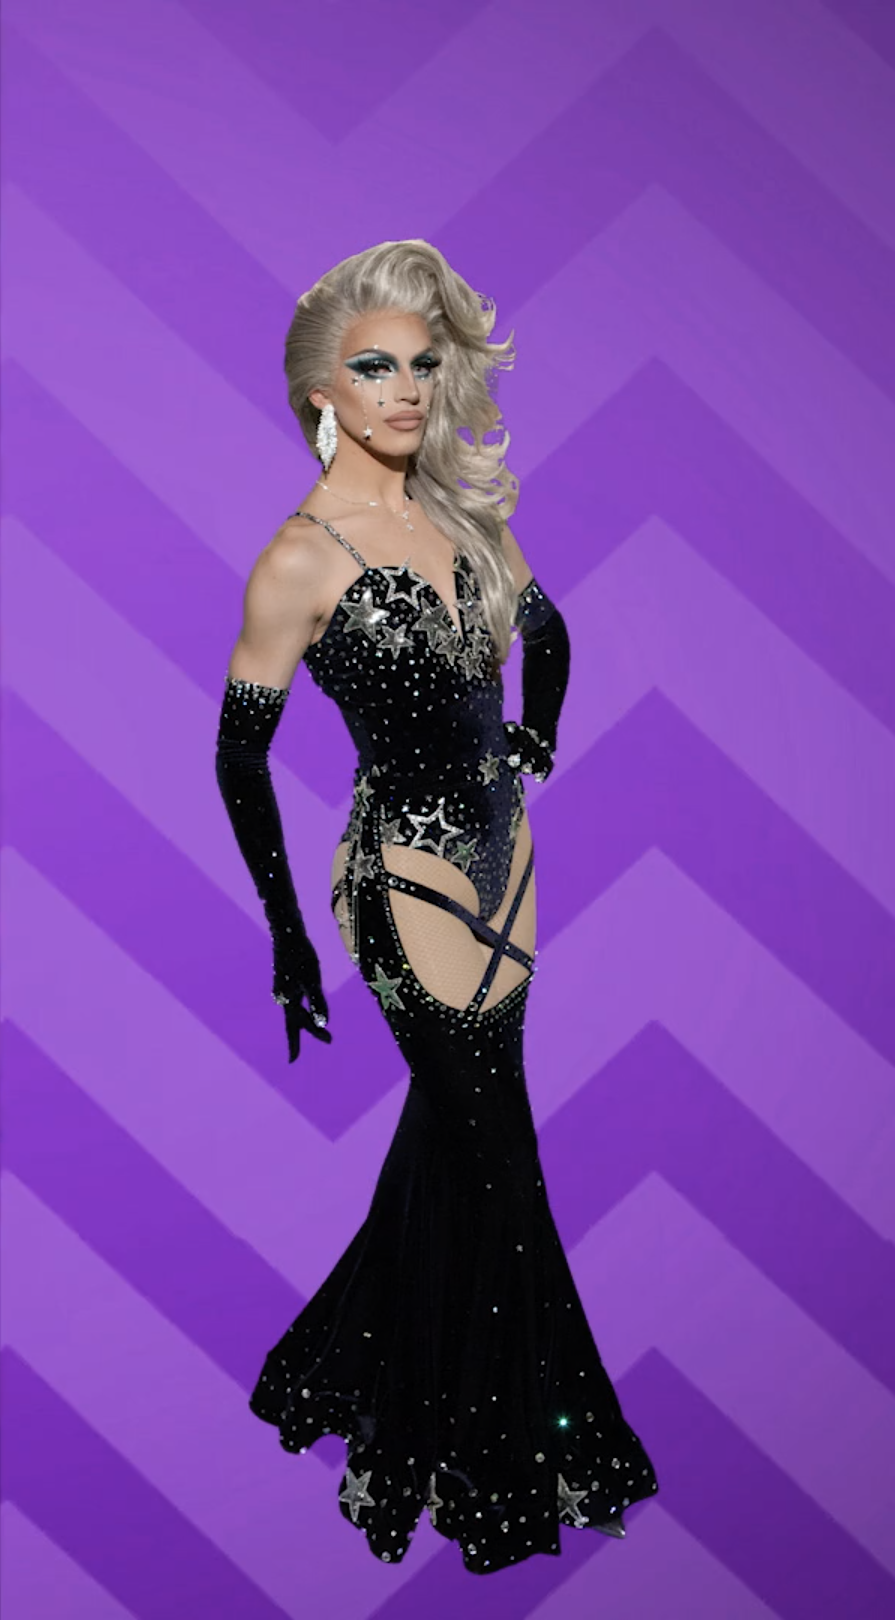 image aquaria final 4 look png rupaul s drag race wiki fandom